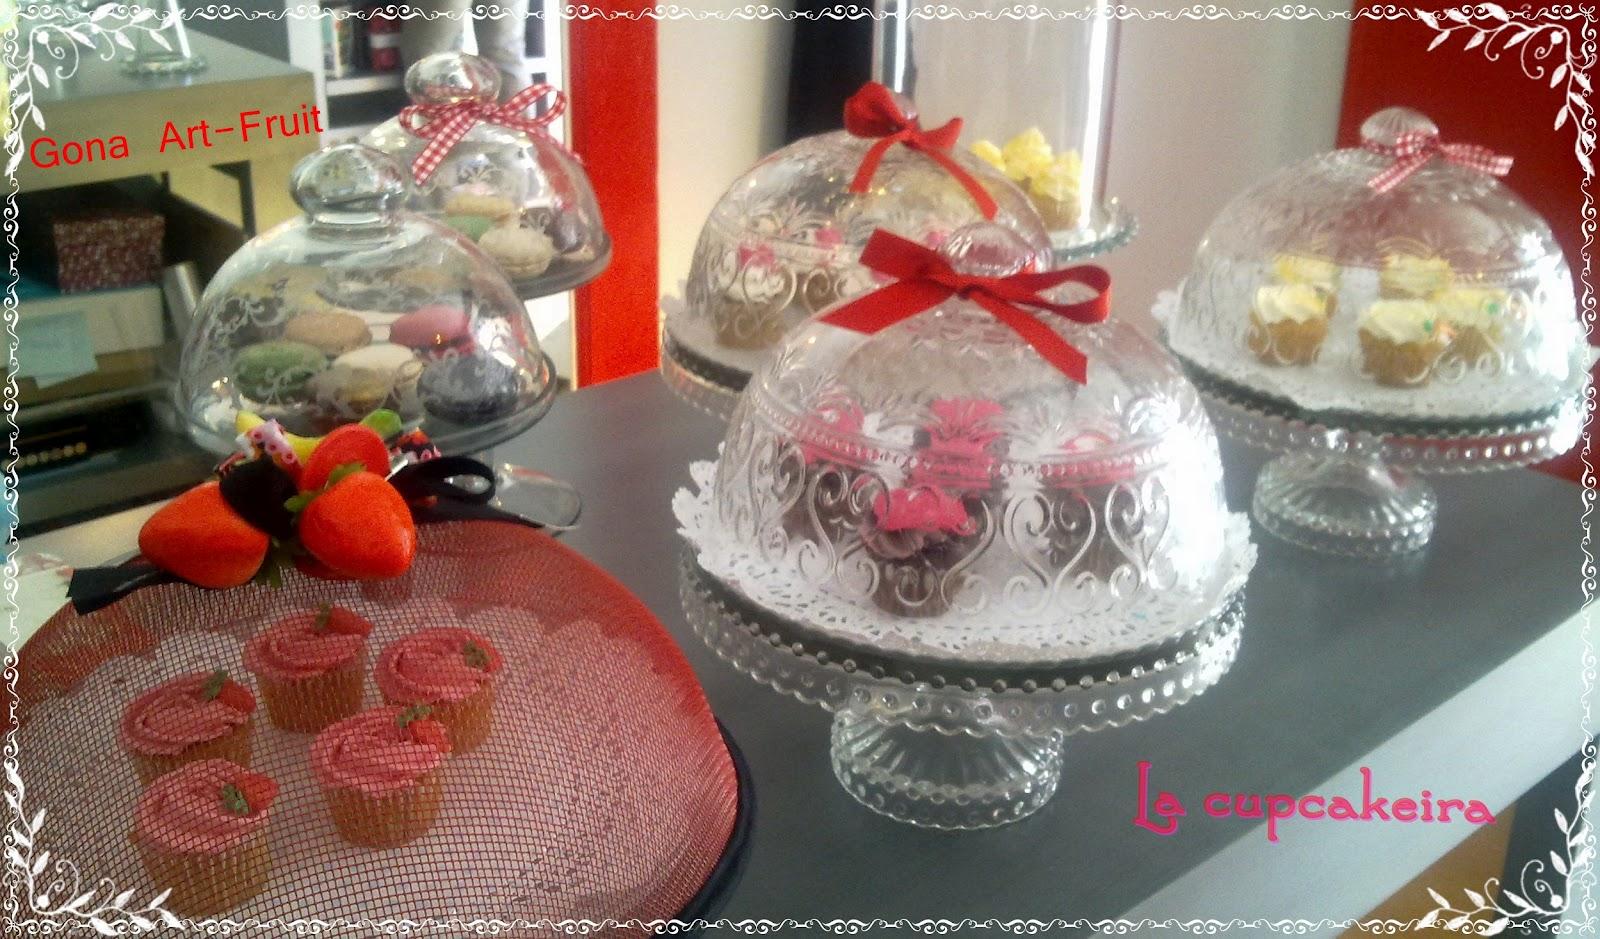 La cupcakeira mini cupcakes y tienda en tenerife - Cupcakes tenerife ...